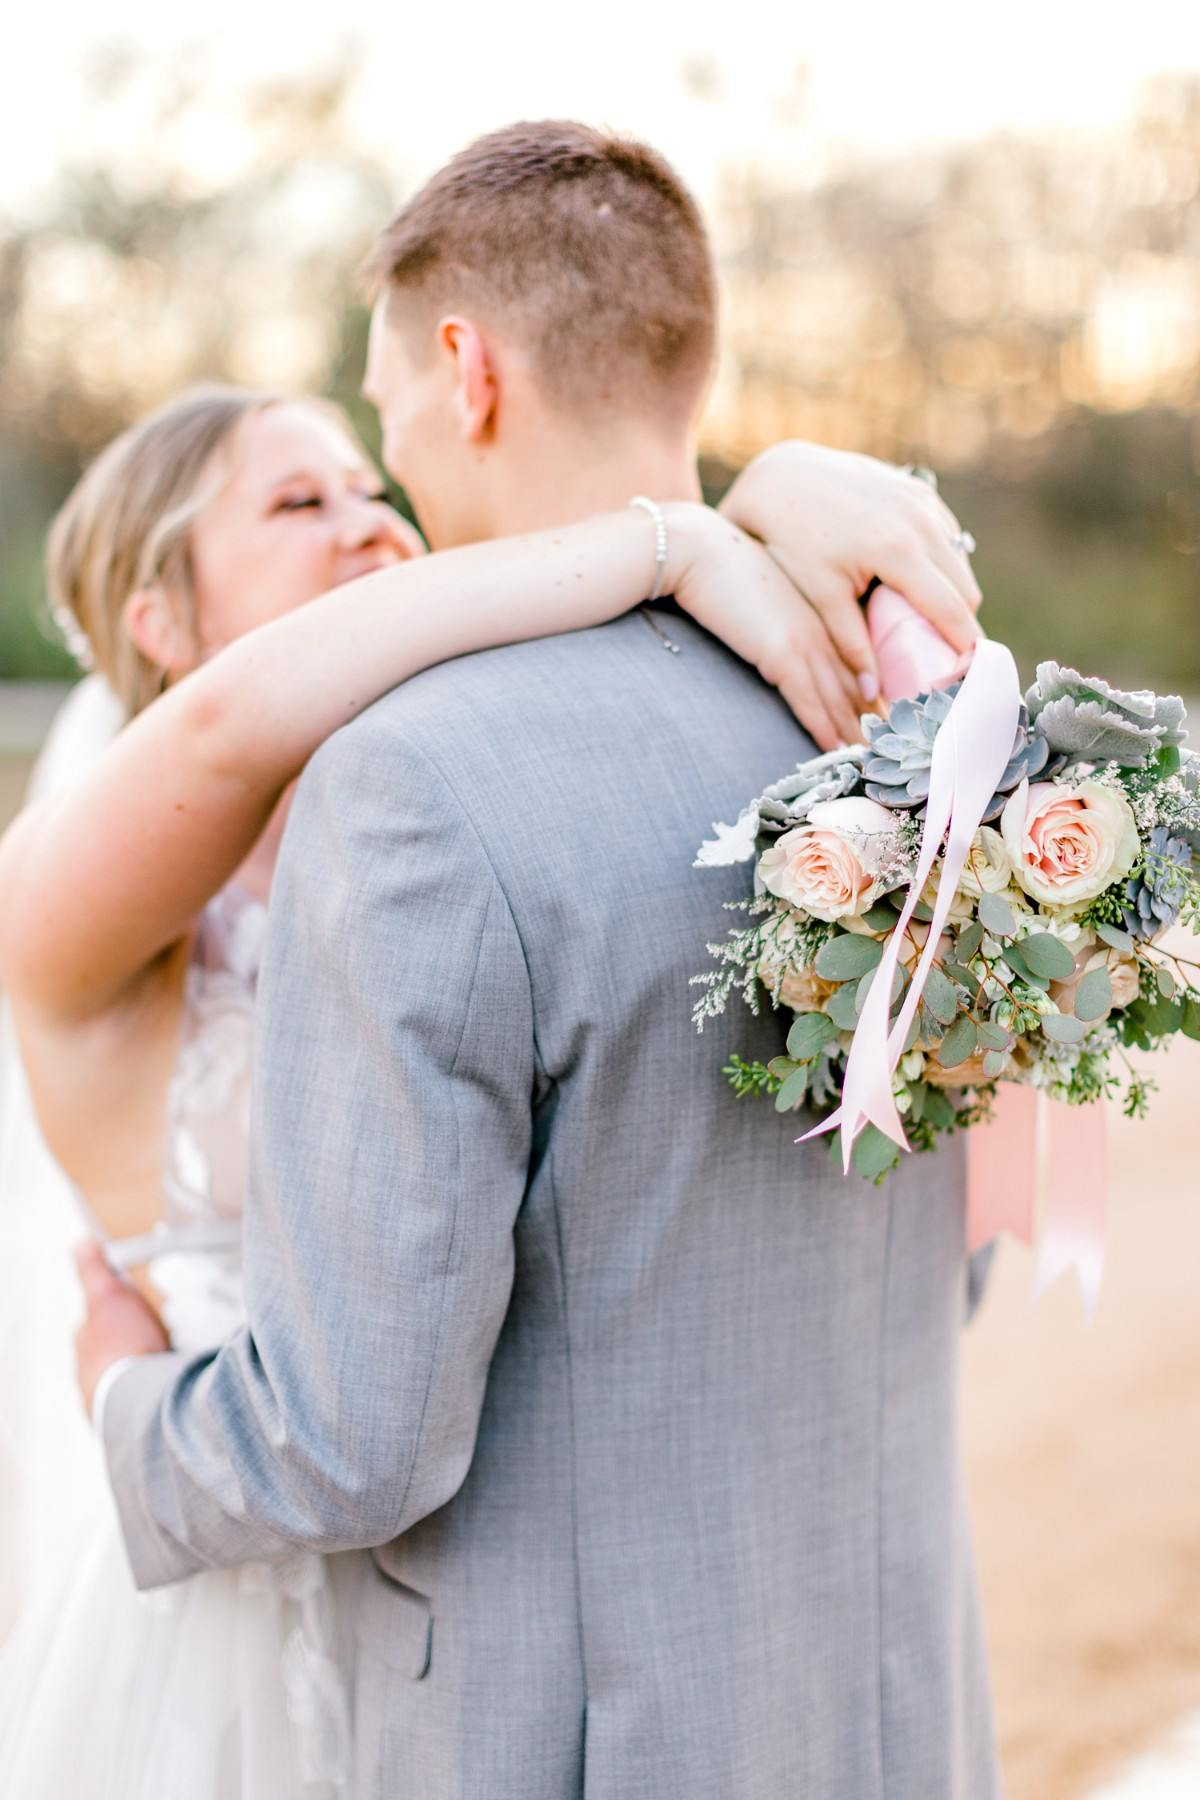 ennis-texas-wedding-photographer-kaitlyn-bullard-109.jpg